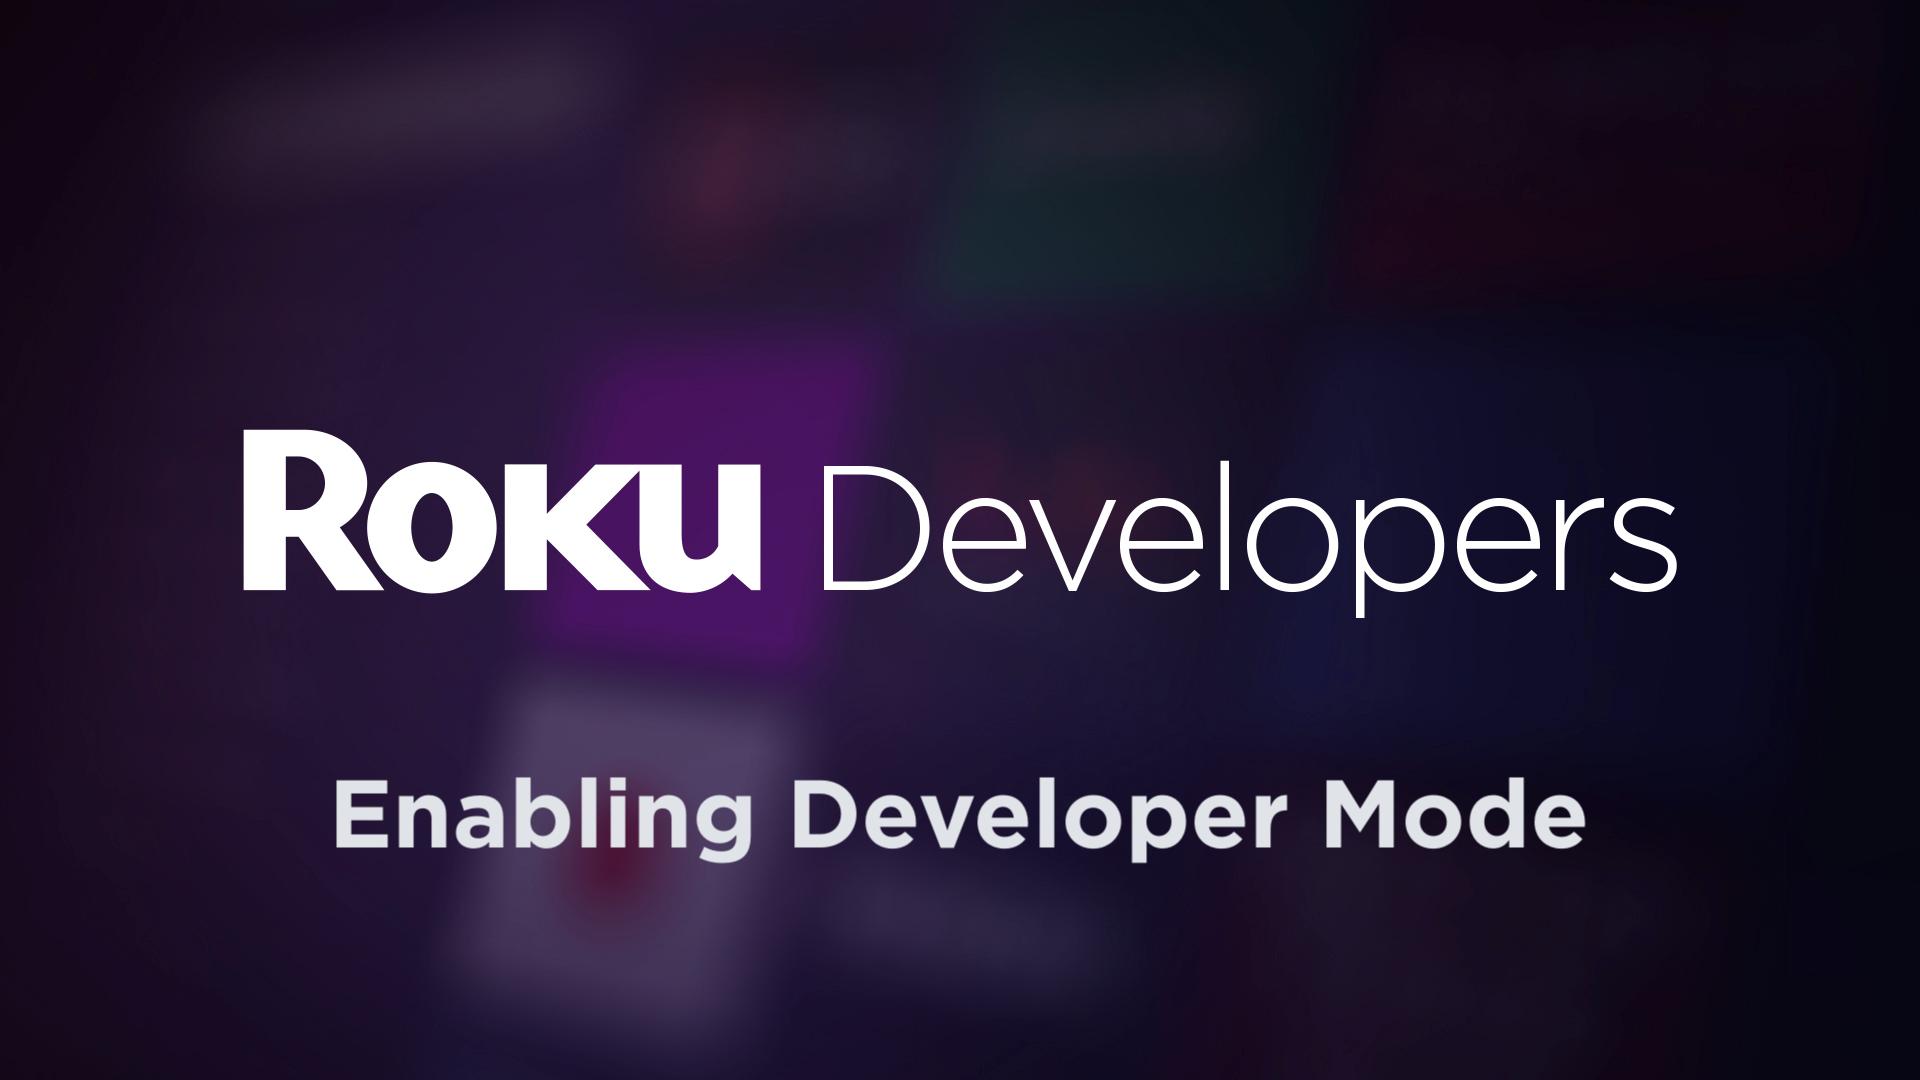 Roku SceneGraph Developers Getting started: Enabling Roku Developer mode